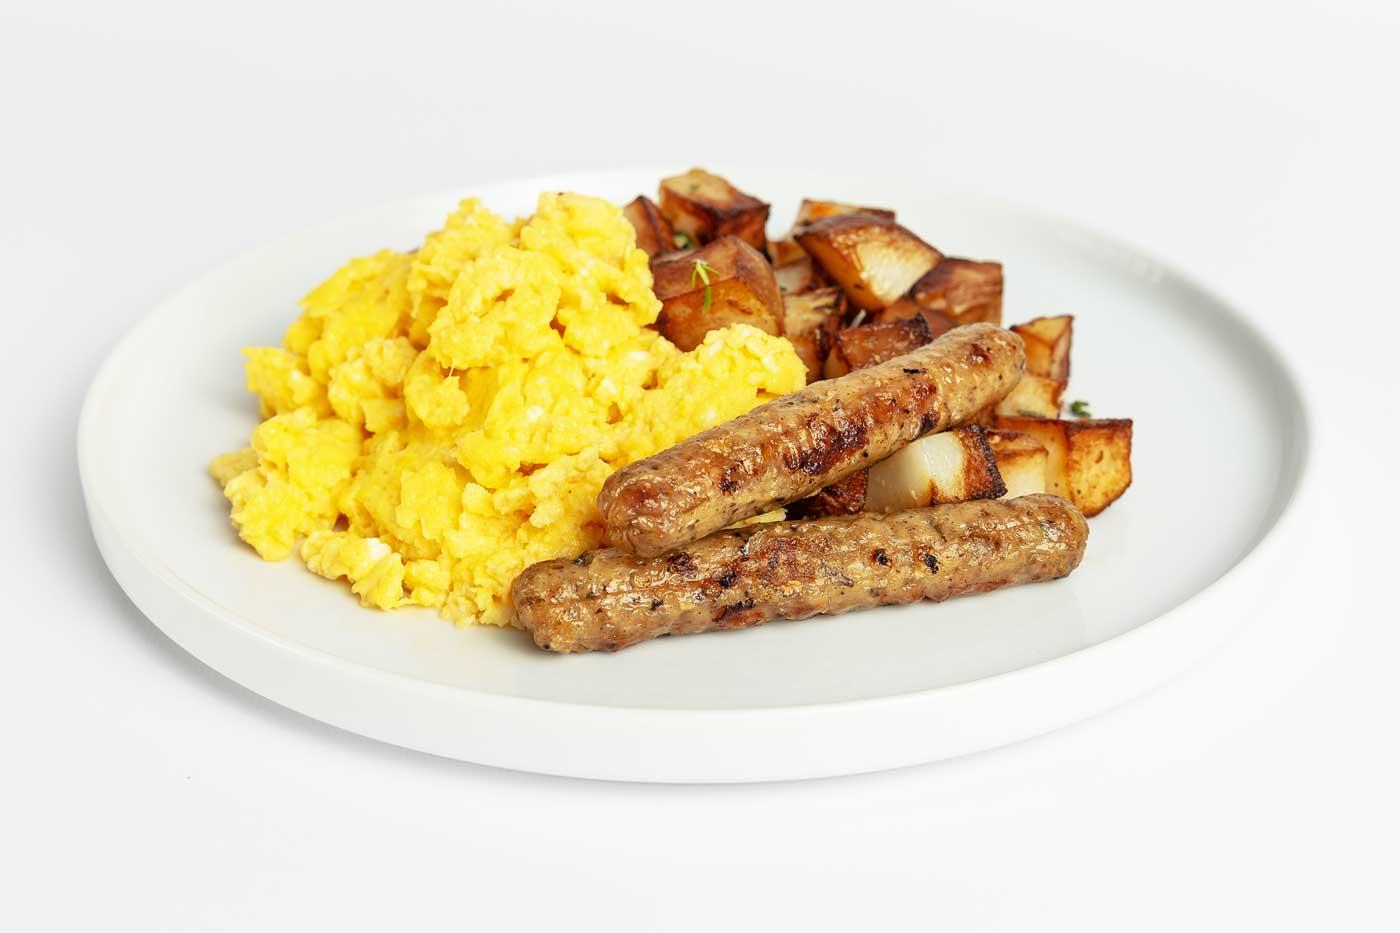 Paleo Meal Free Range Egg Scramble